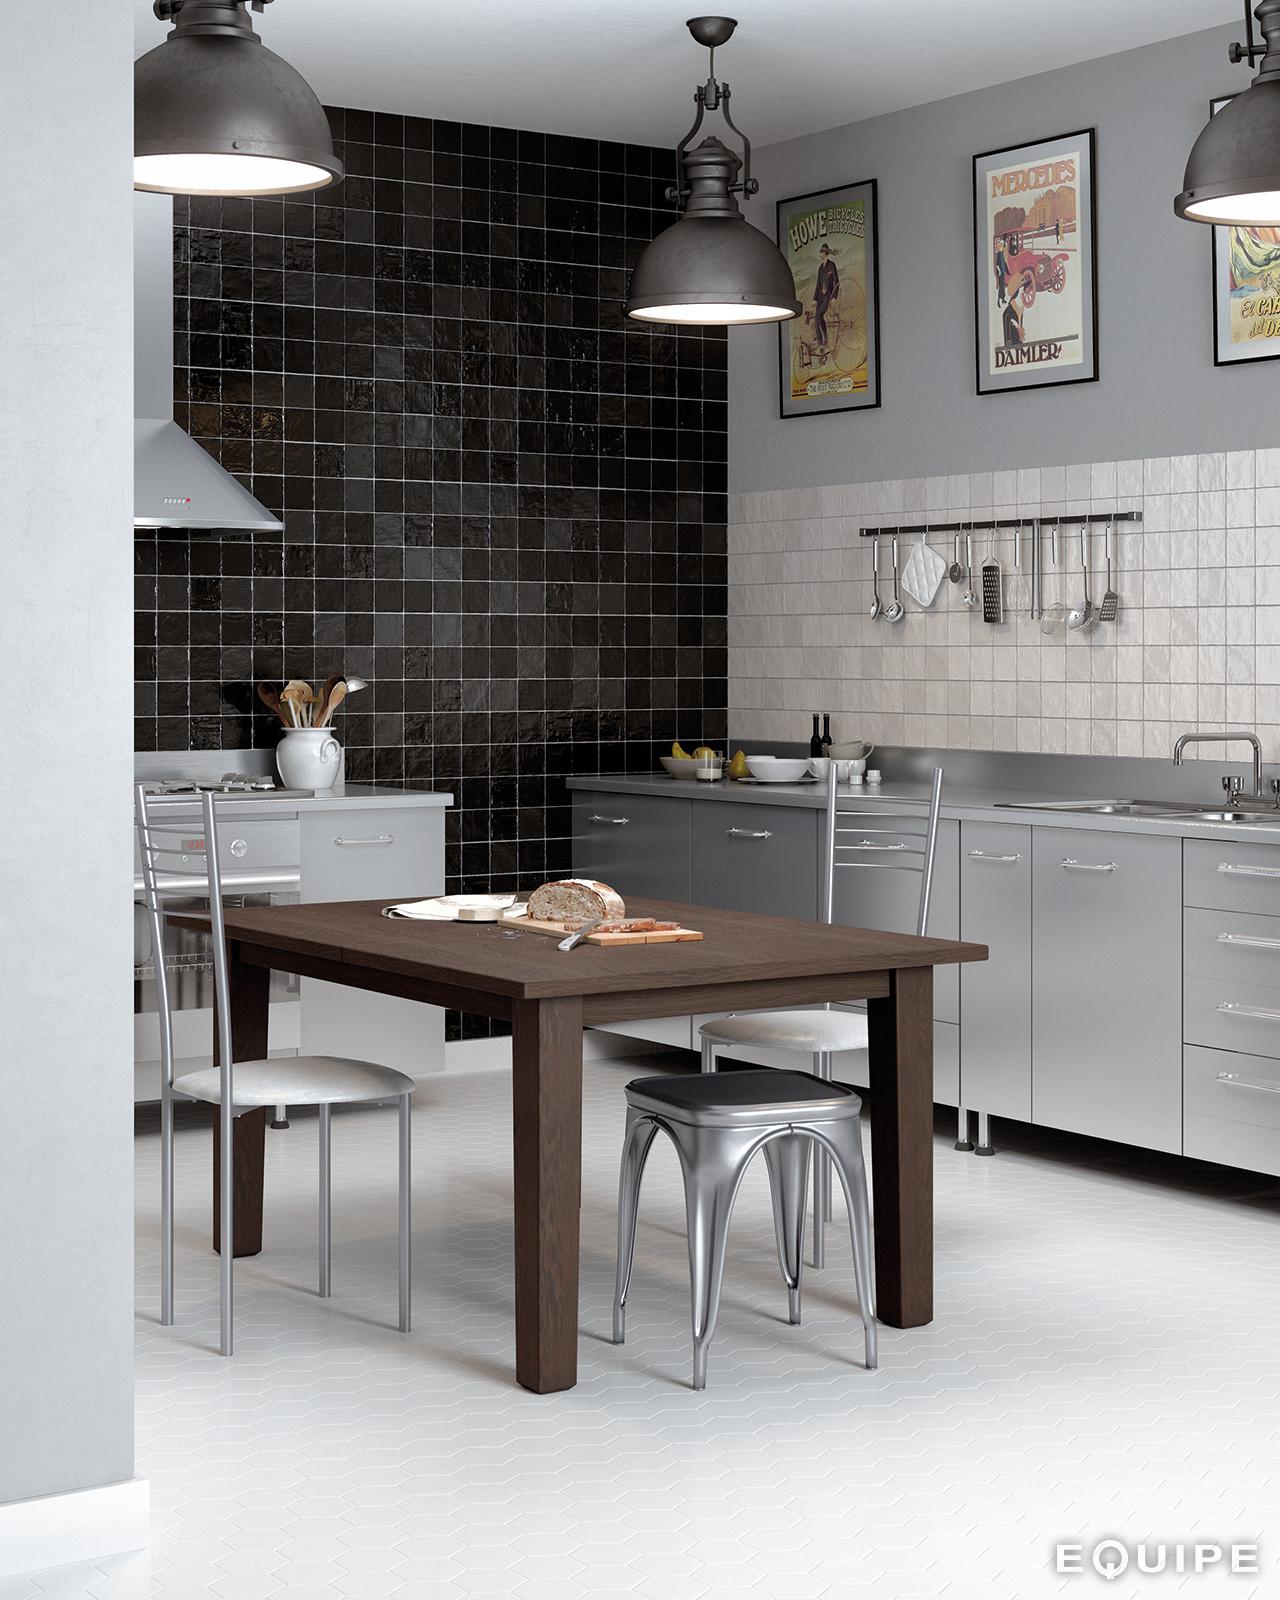 Mallorca 100x100 B&W Kitchen